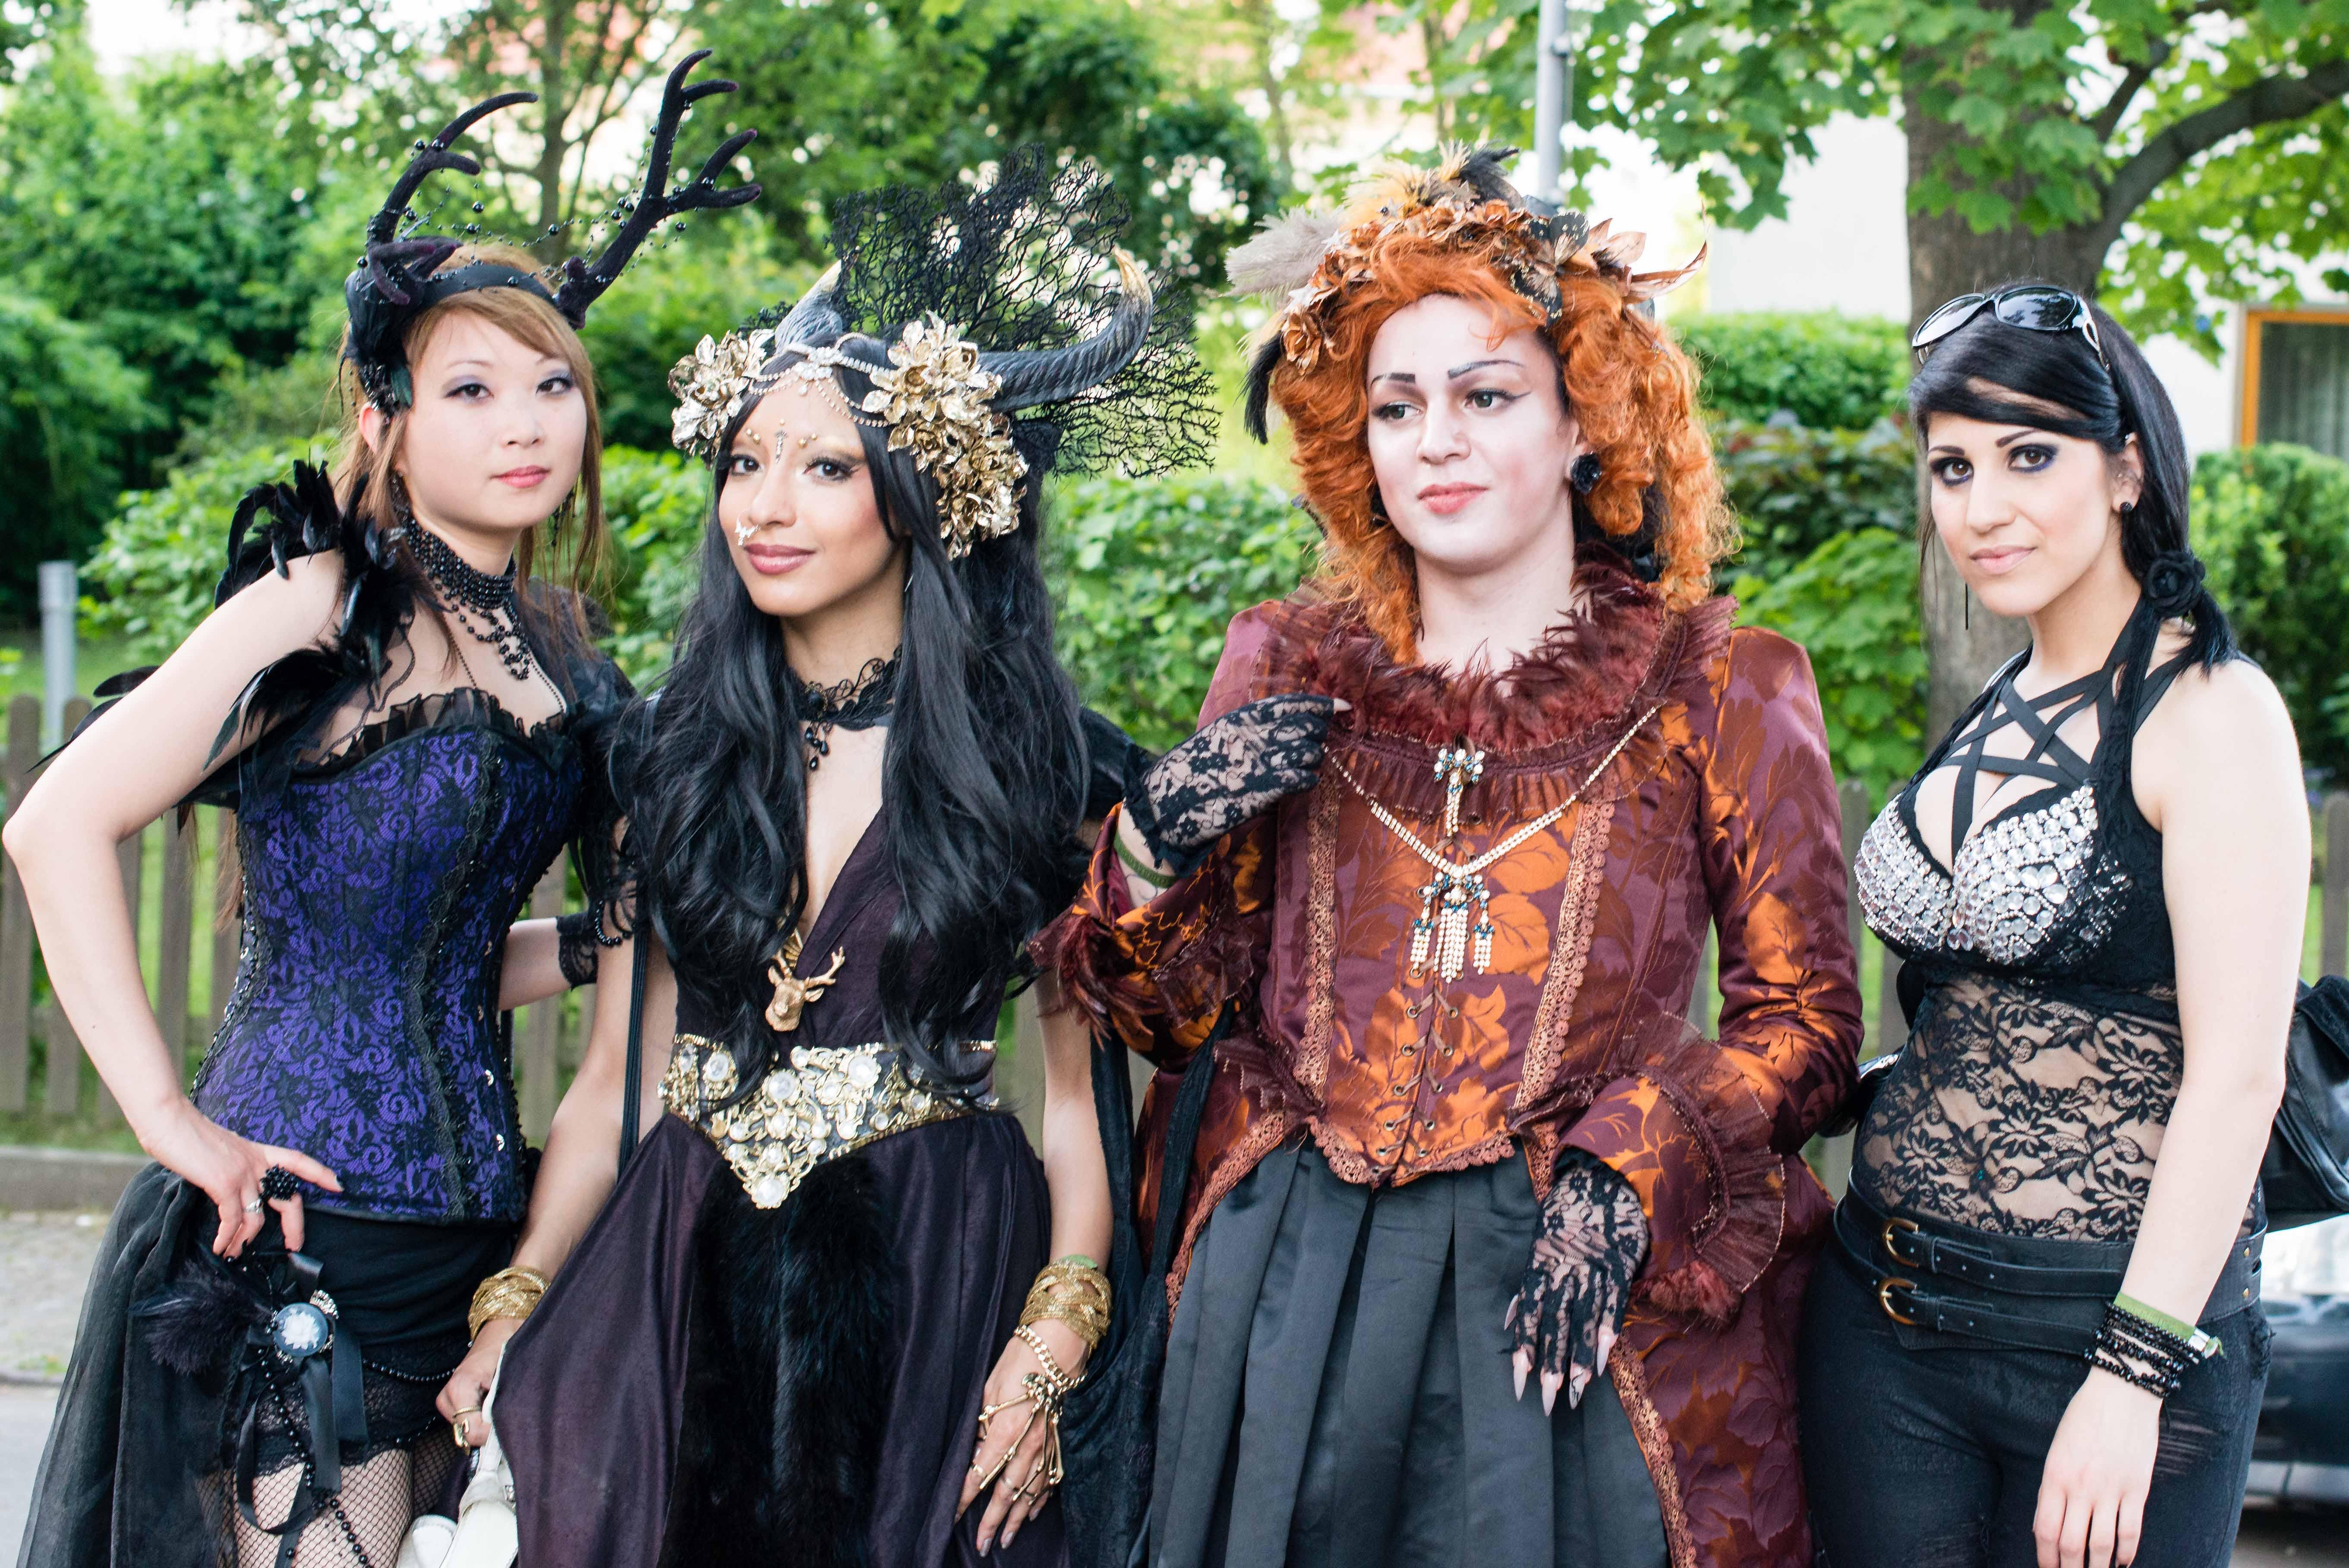 Wave Gotik Treffen- gloomy gothic music festival in